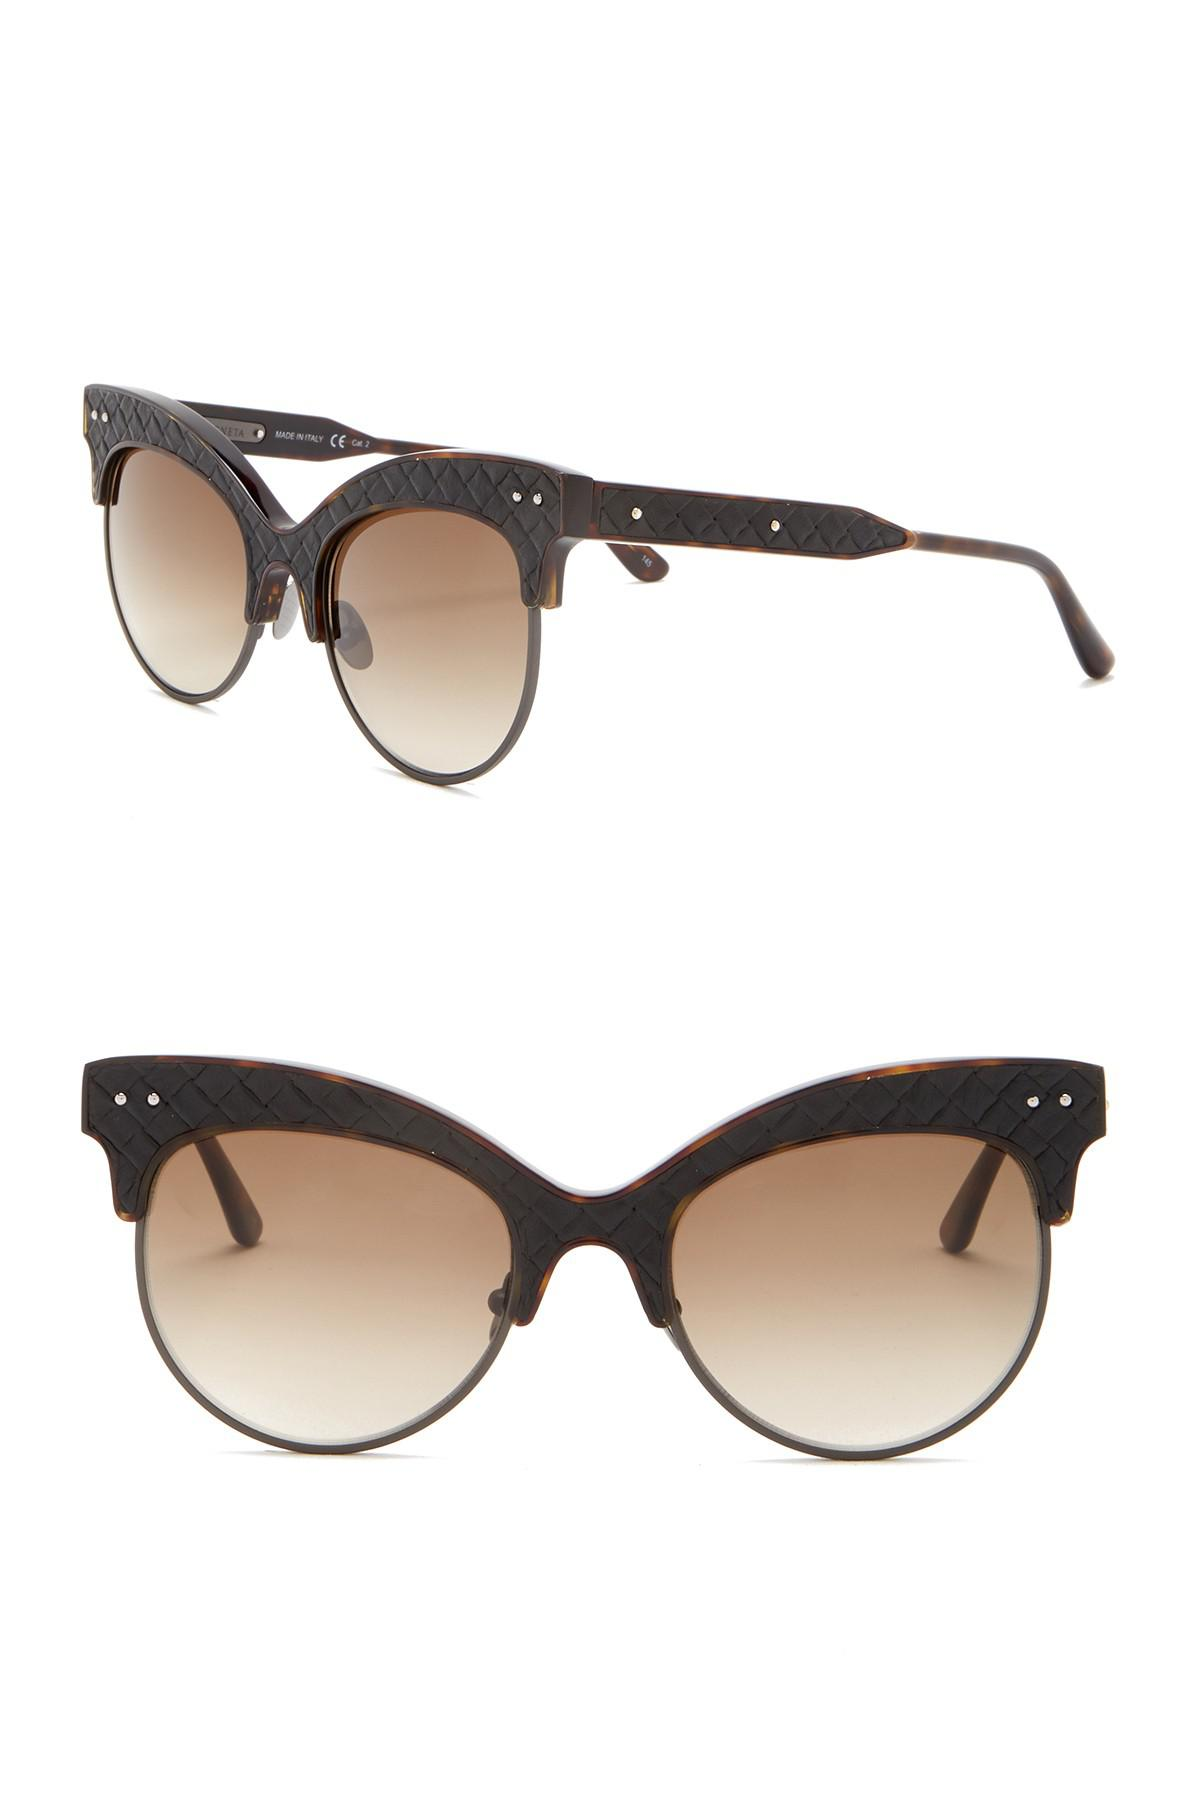 ae103d5257 Lyst - Bottega Veneta 52mm Cat Eye Sunglasses in Brown - Save ...